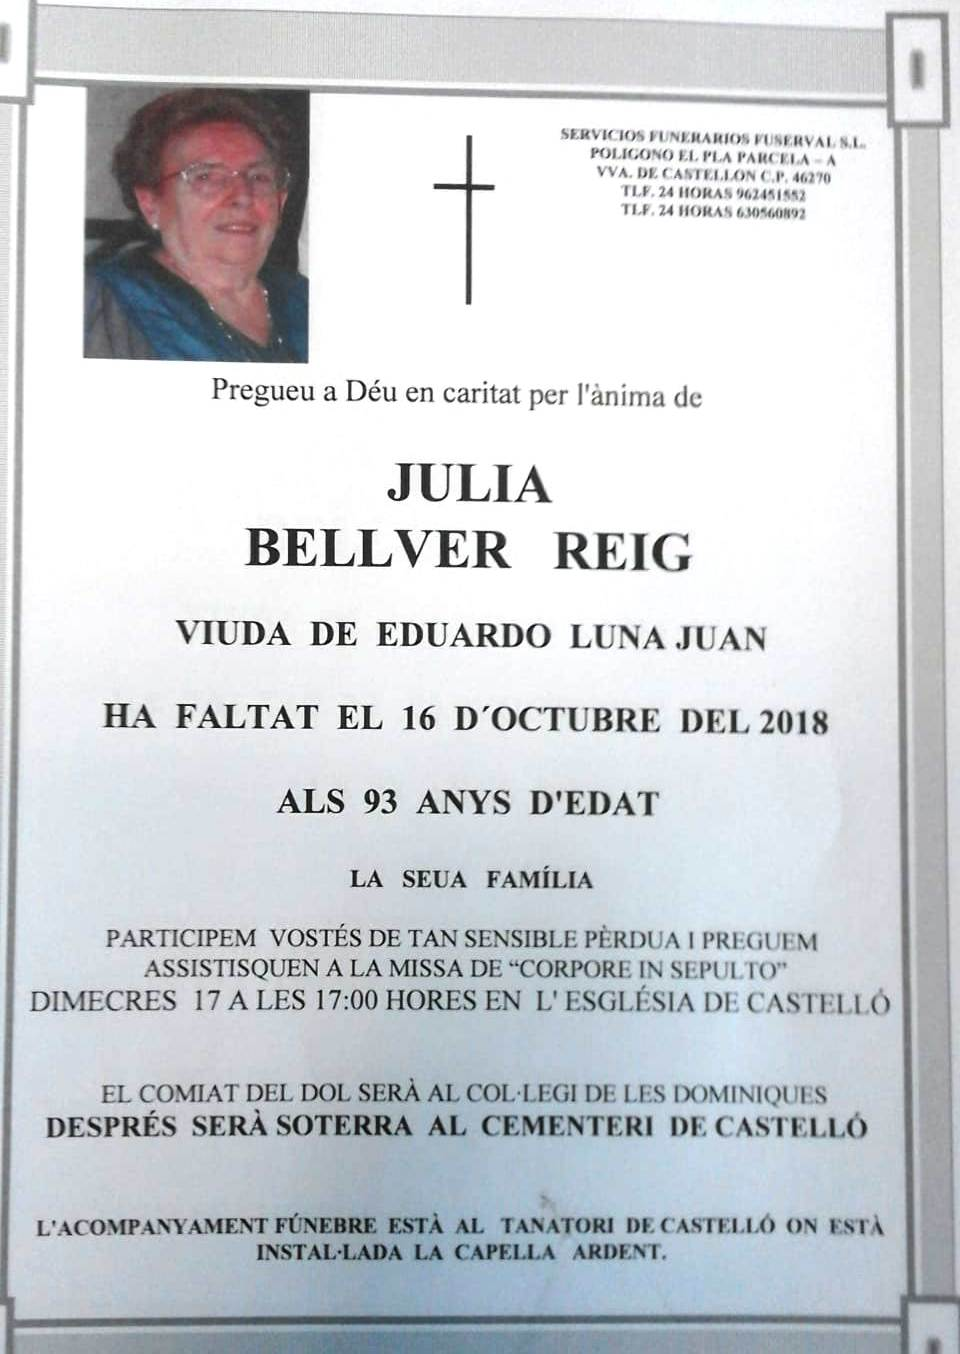 JULIA BELLVER REIG